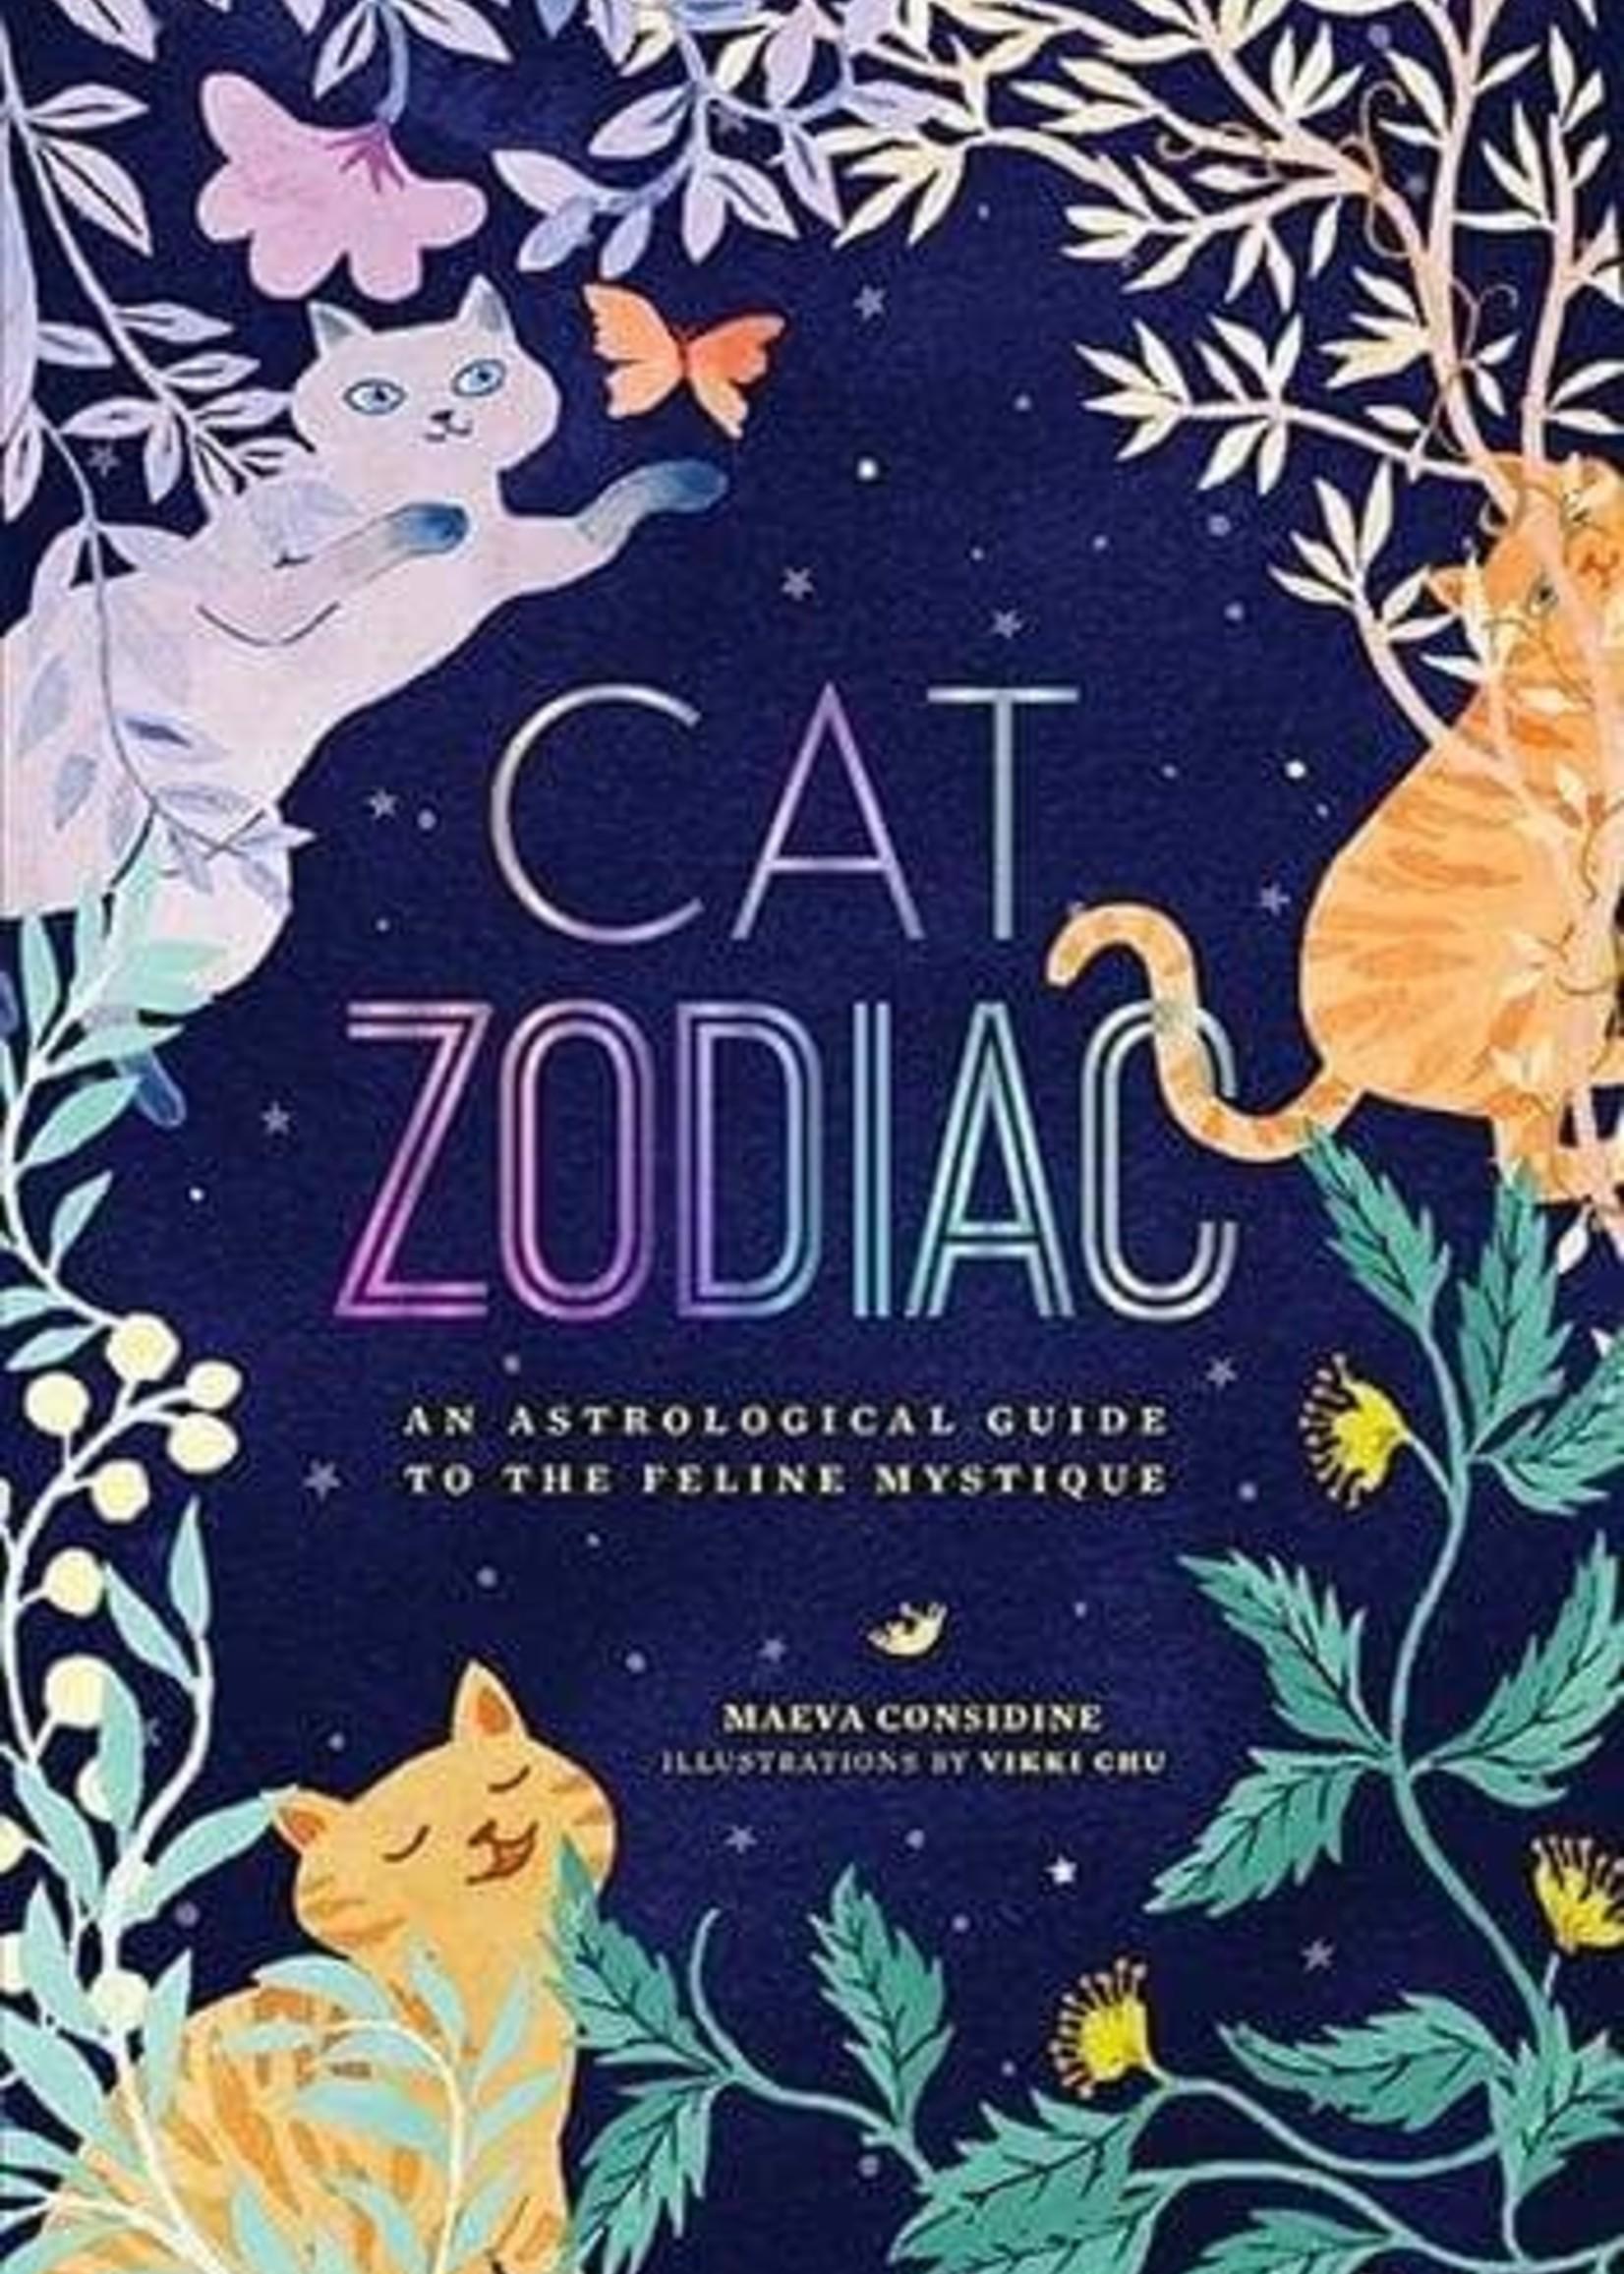 Cat Zodiac: An Astrological Guide to the Feline Mystique BY MAEVA CONSIDINE ; ILLUSTRATED BY VIKKI CHU